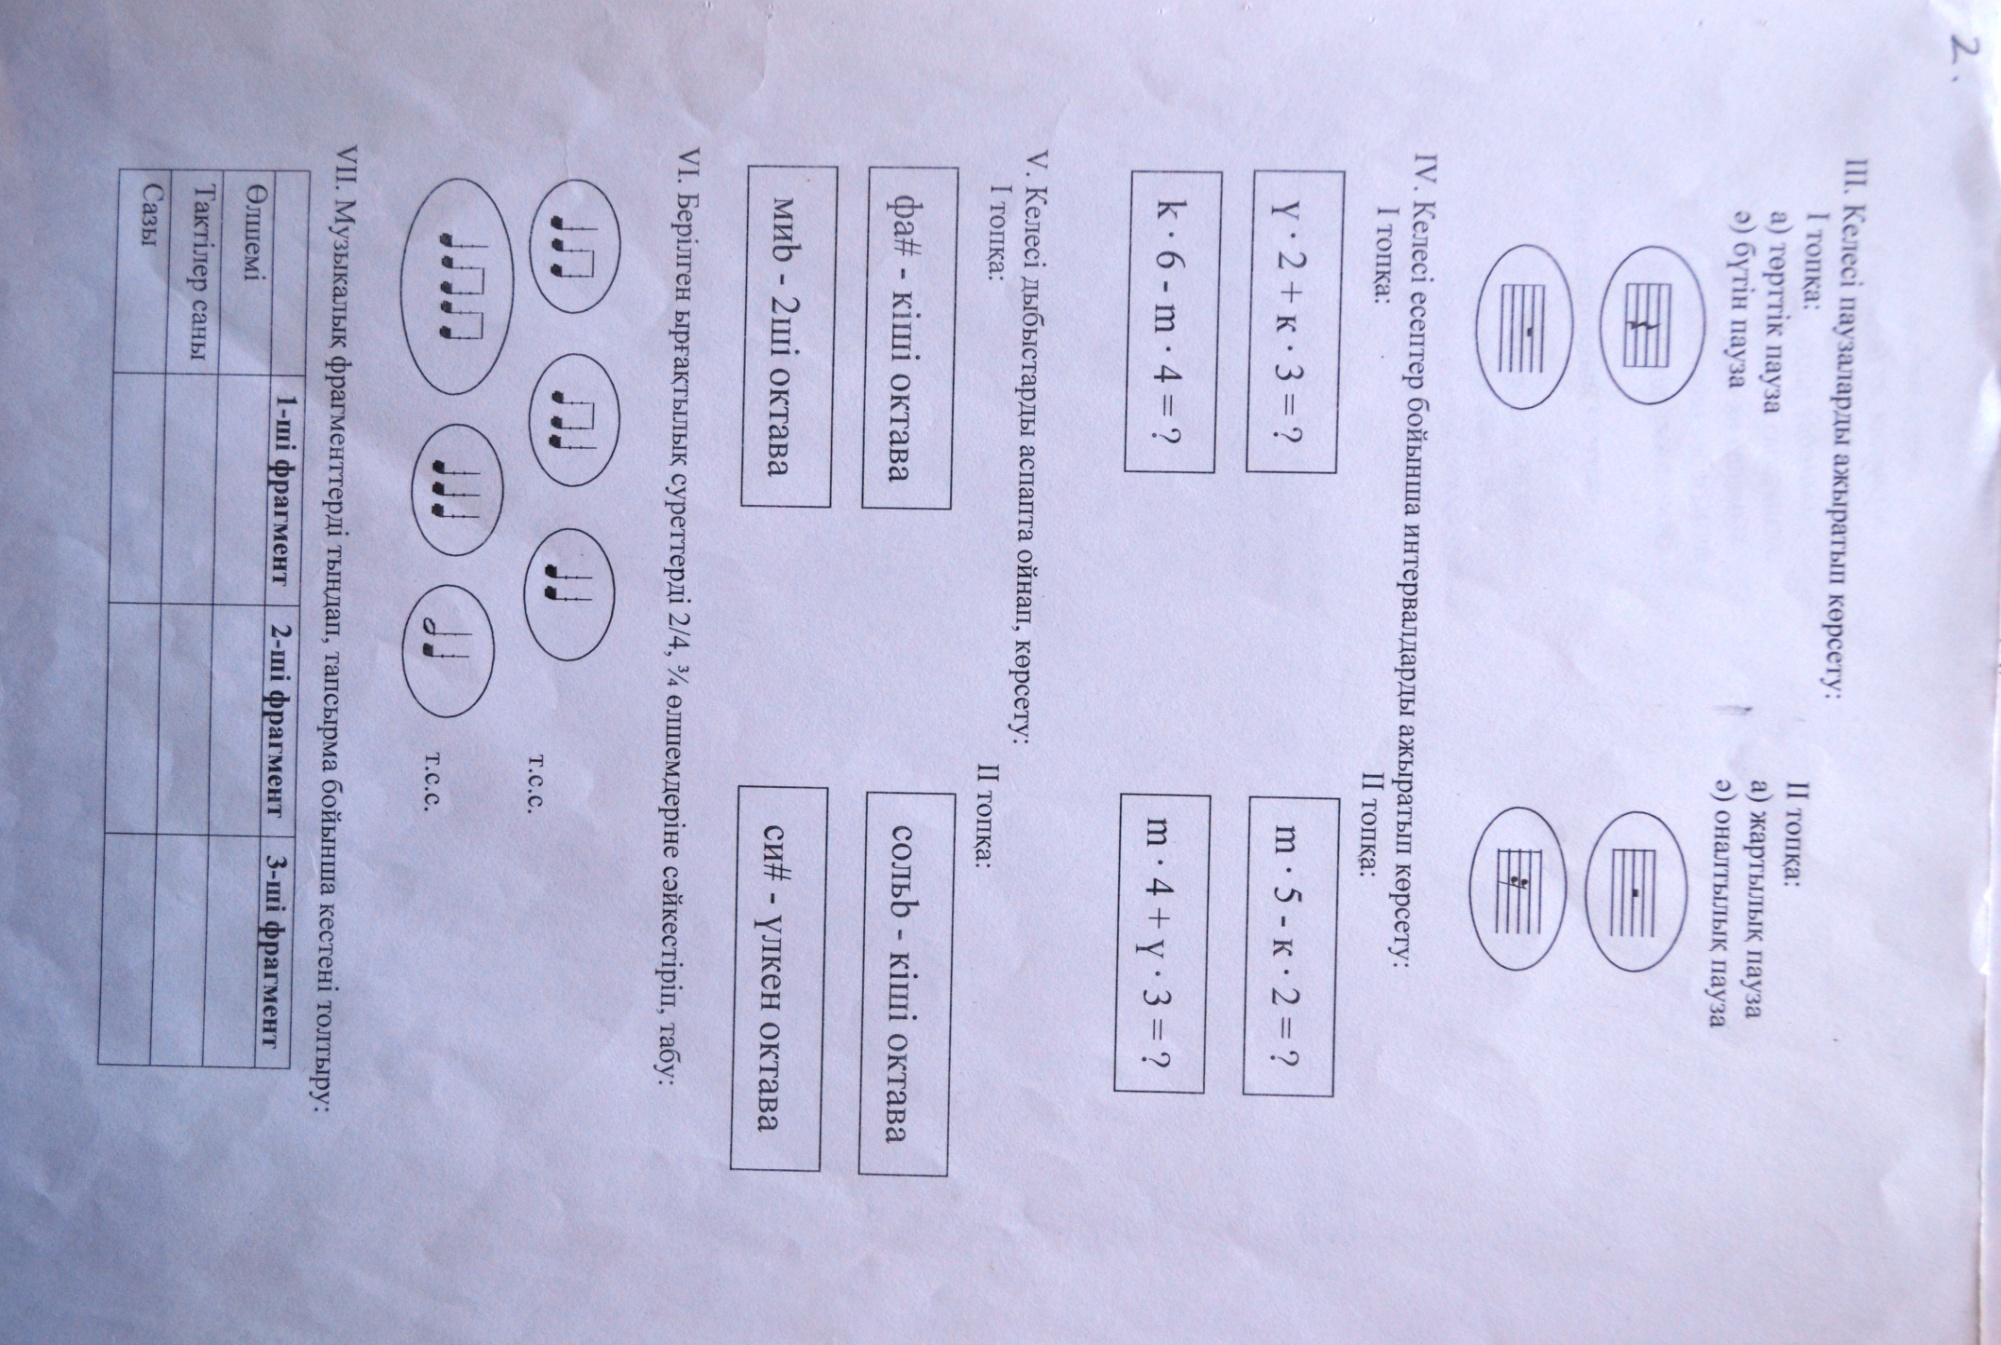 DSC_0495 (5).jpg